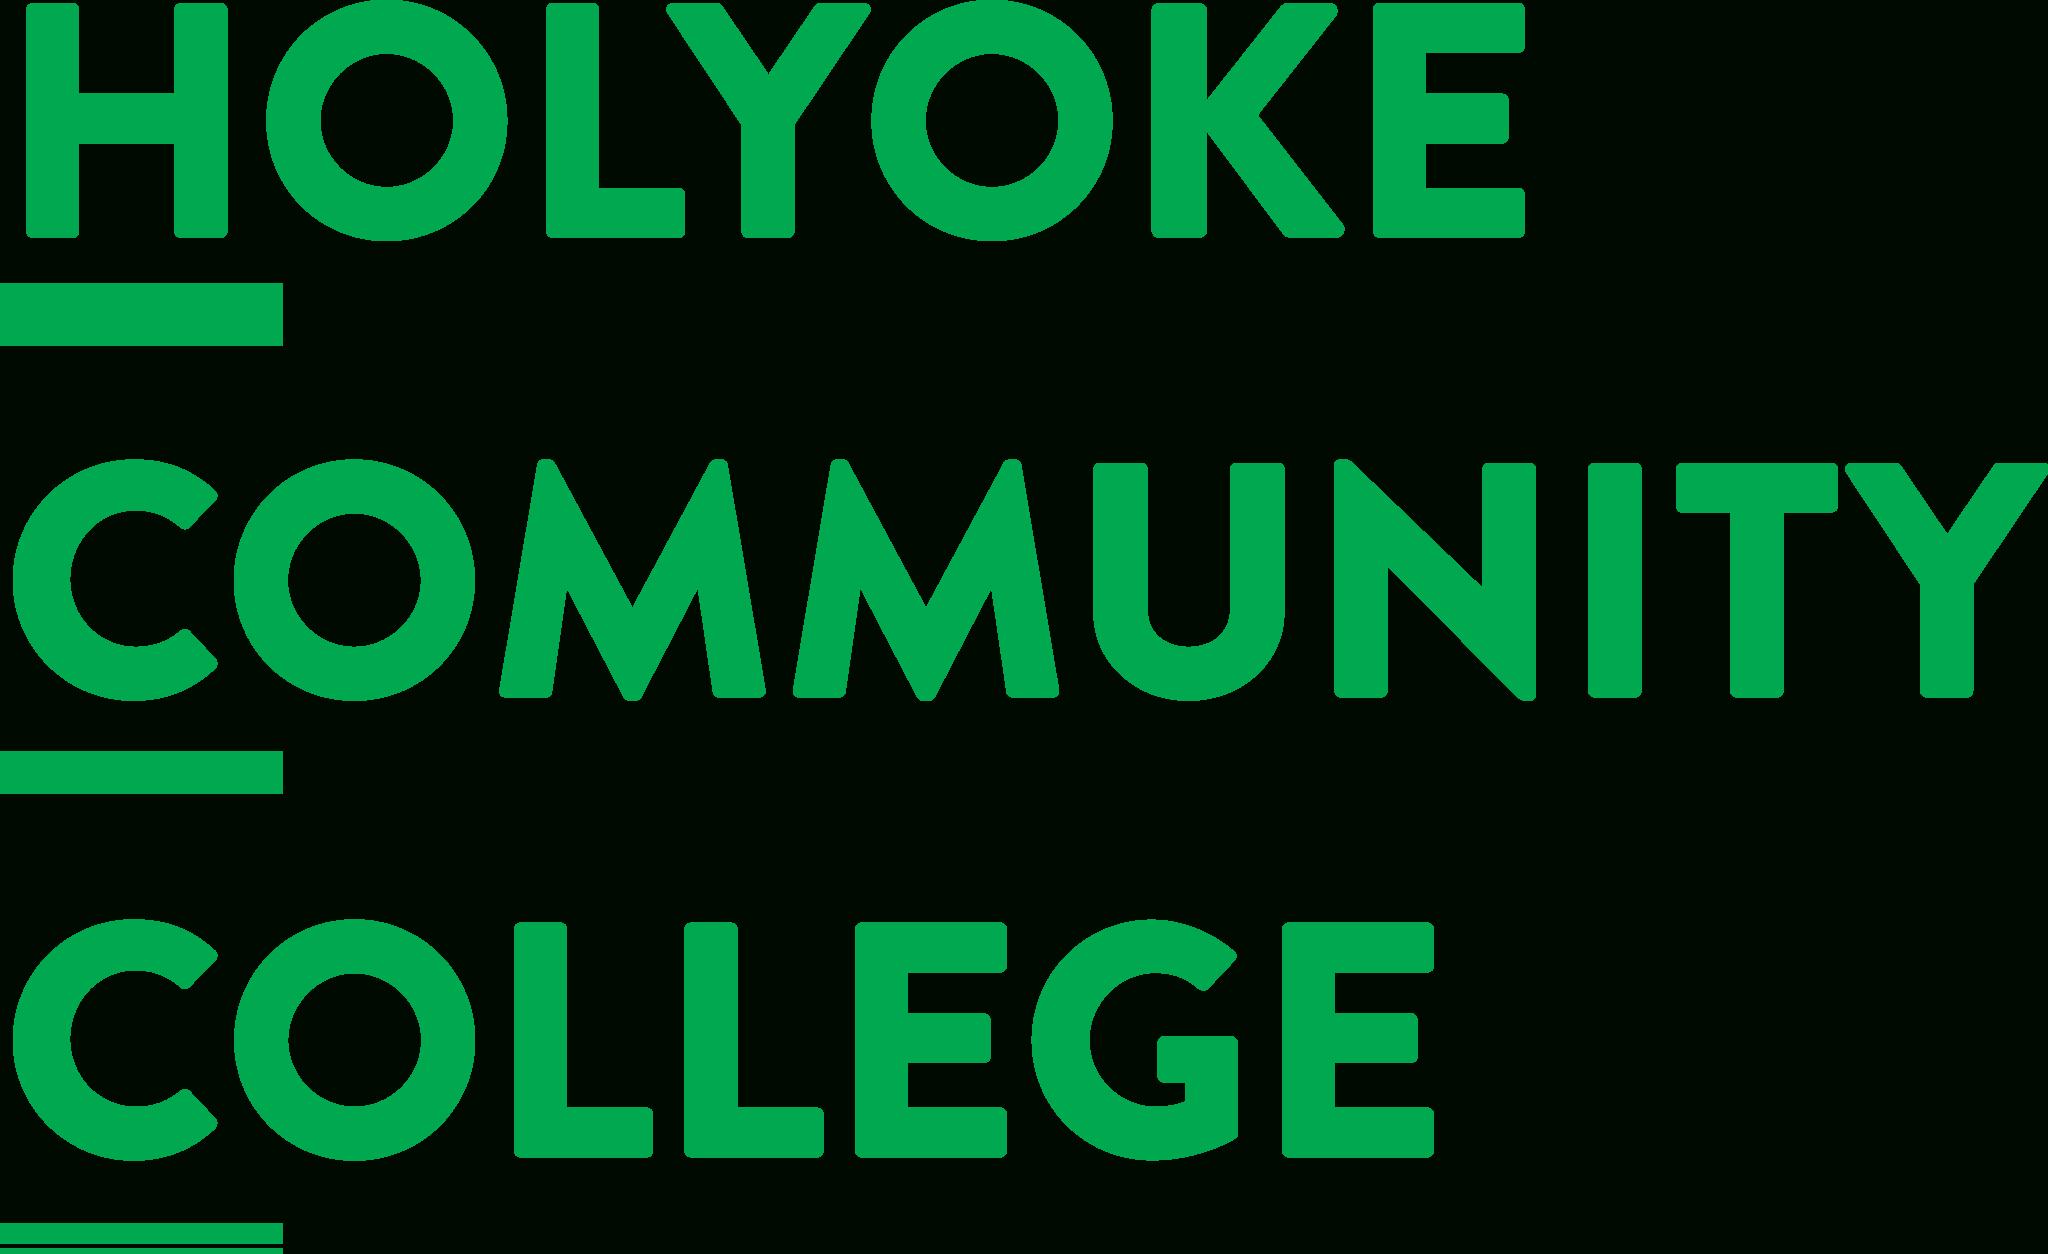 Academic Calendar | Holyoke Community College Throughout Houston Communiry College Calender